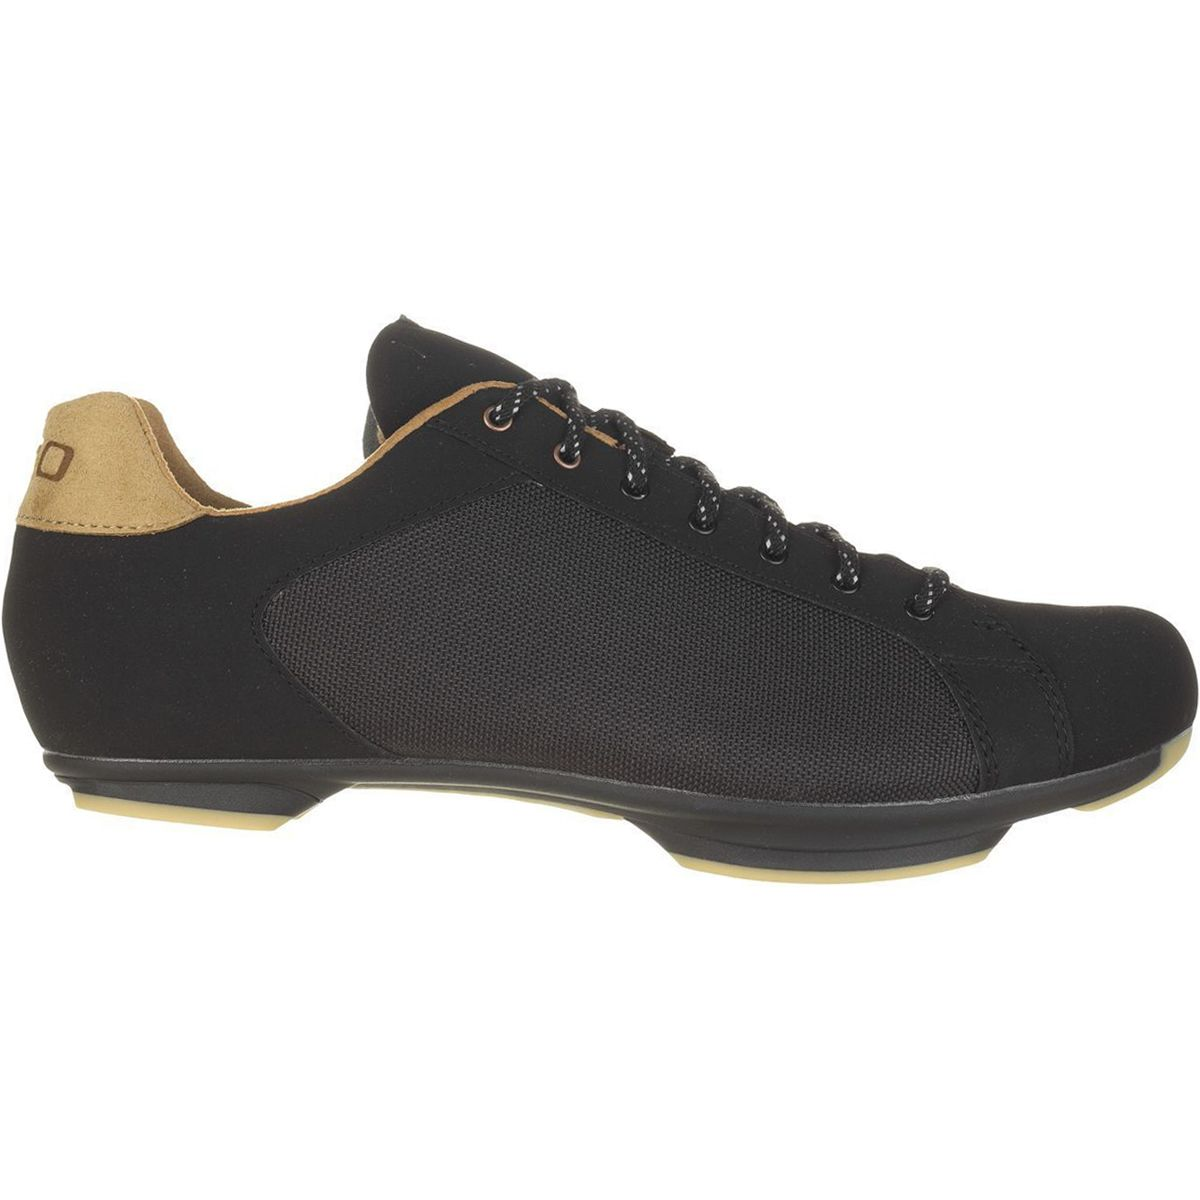 c59c12e11dd Giro New Road Republic Shoes Black Canvas Gum 440